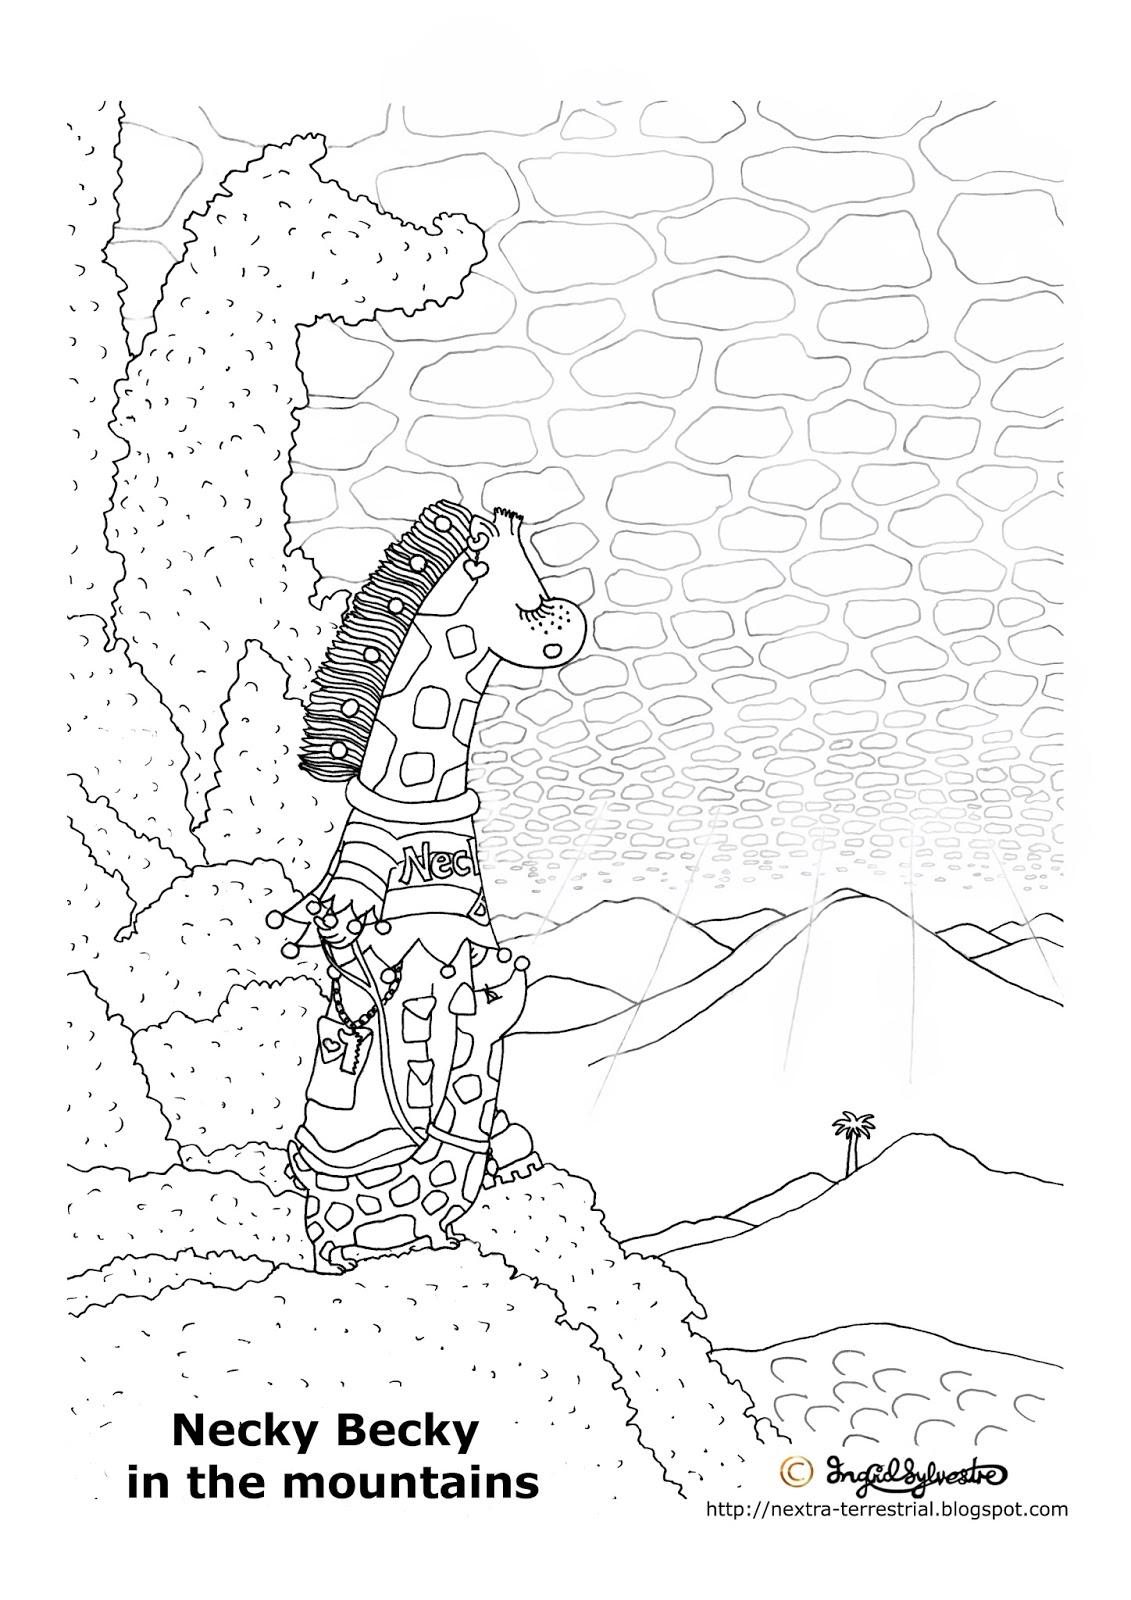 Nextra Terrestrial Giraffe Pictures To Colour